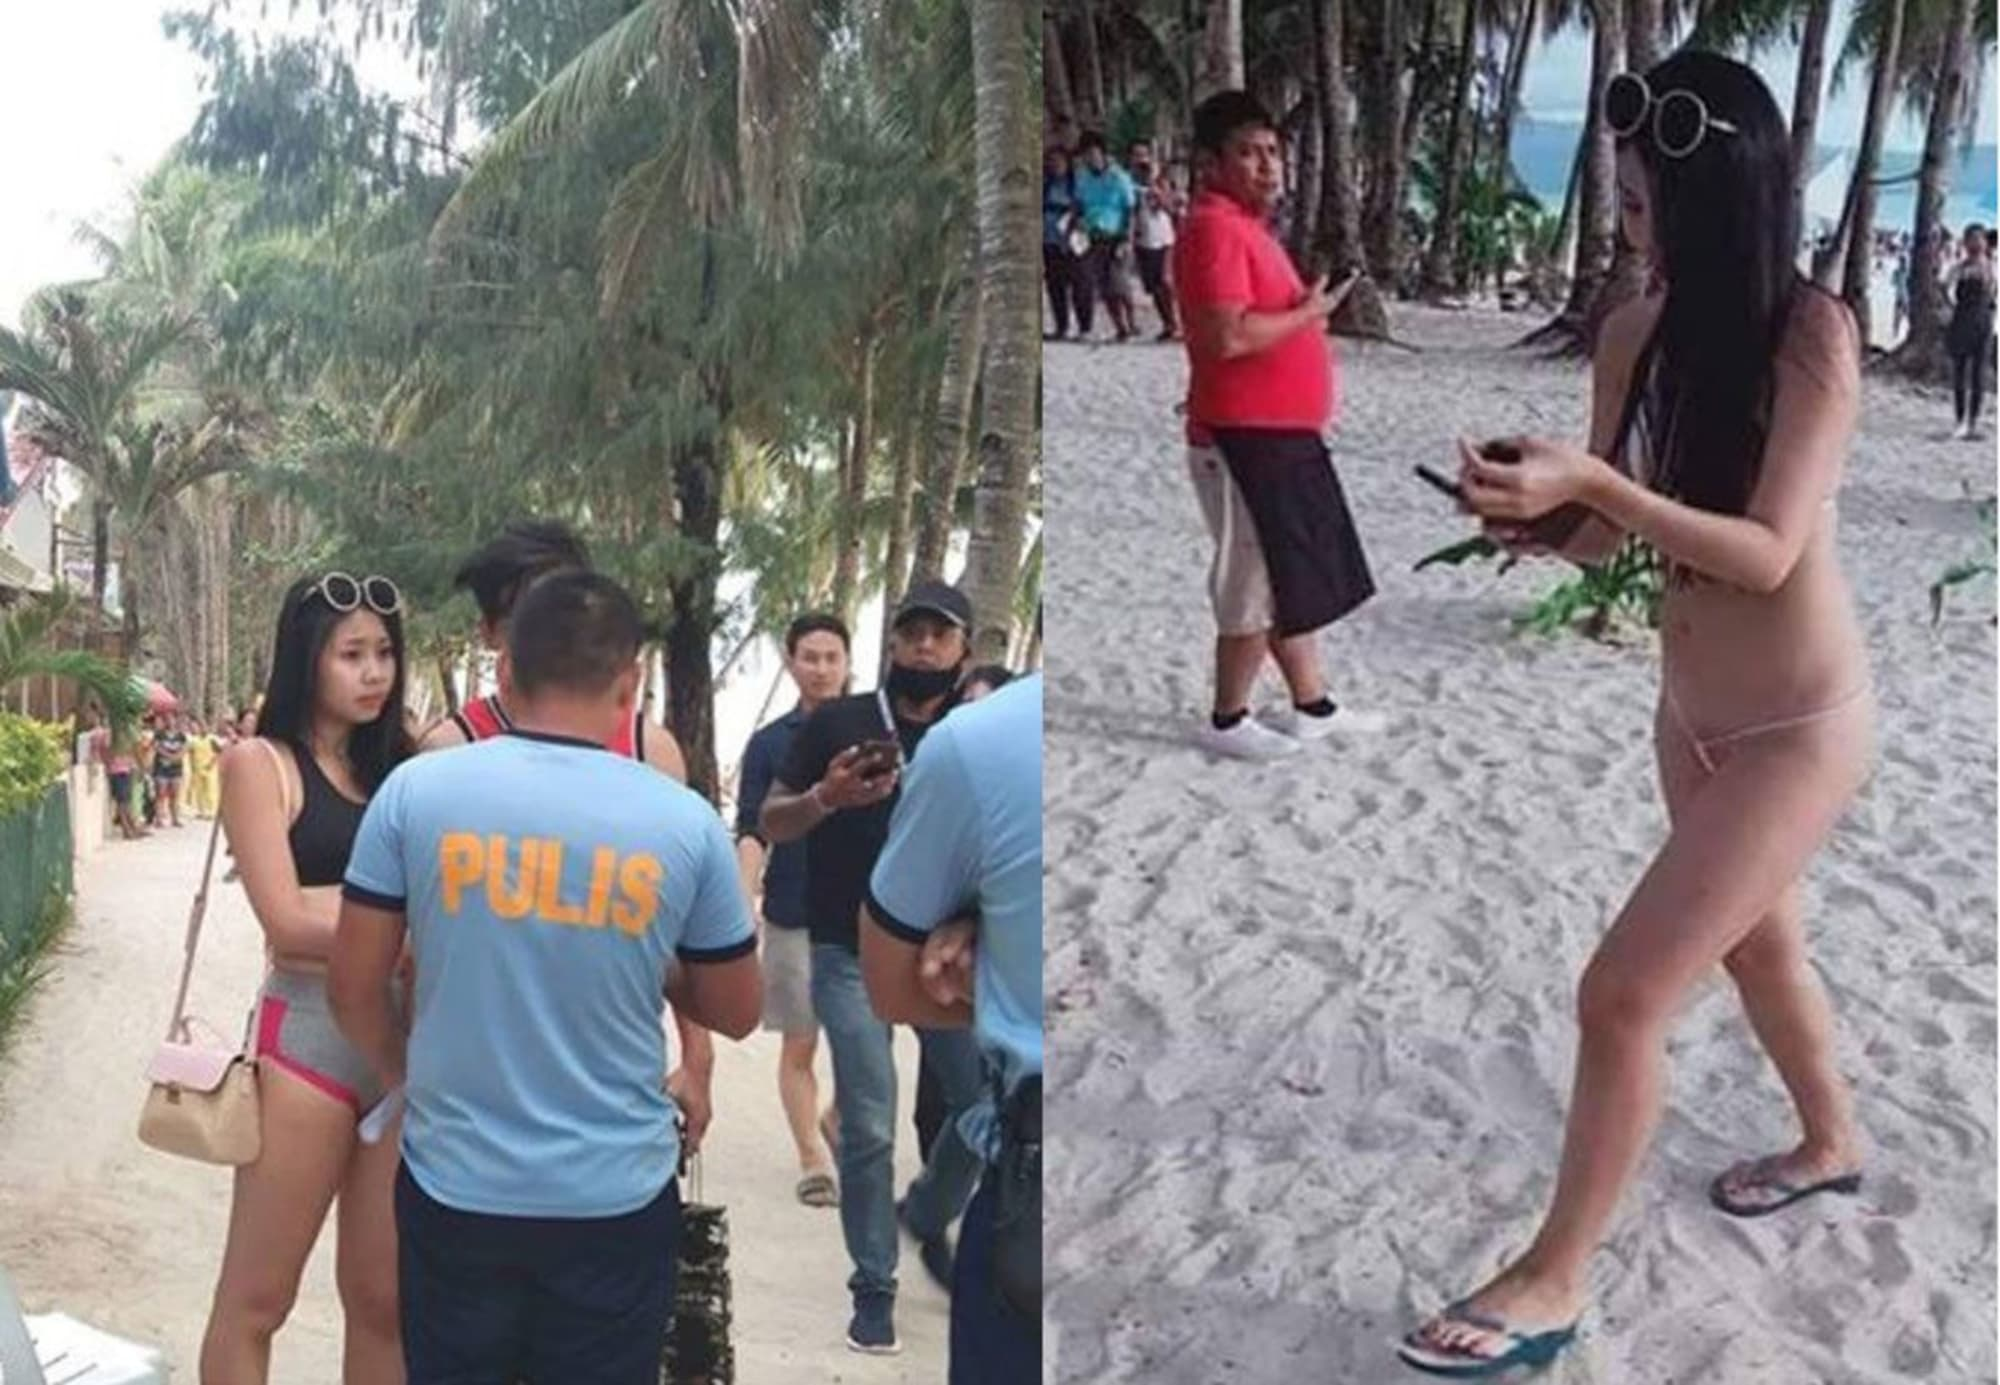 Taiwanese woman on sexy thong bikini arrested, fined in Boracay